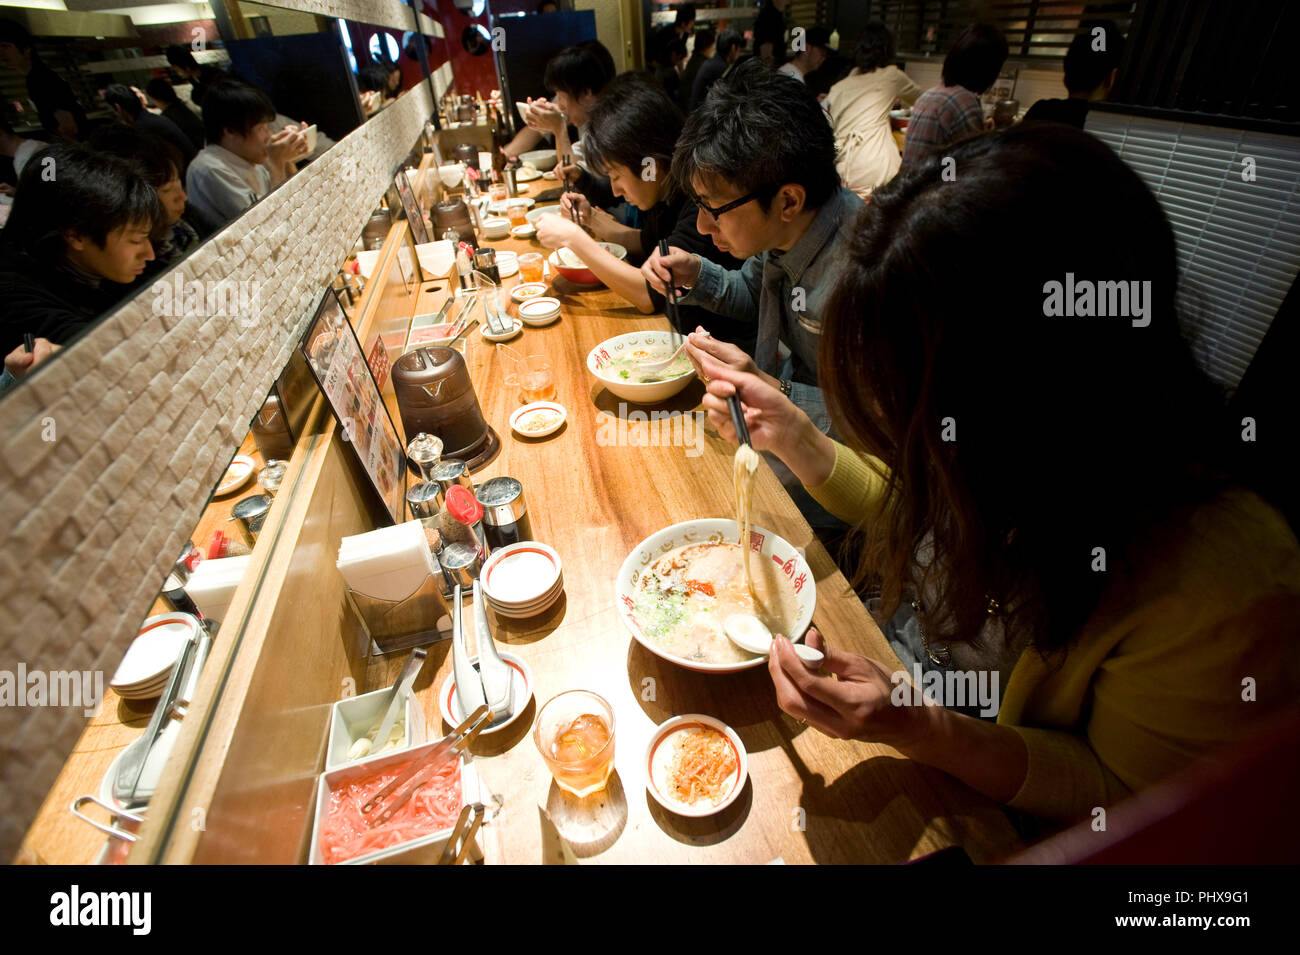 Customers enjoy soup noodles prepared at Hakata Ippudo Ramen's main store in the Daimyo district of Fukuoka City, Fukuoka Prefecture Japan on 08 March - Stock Image